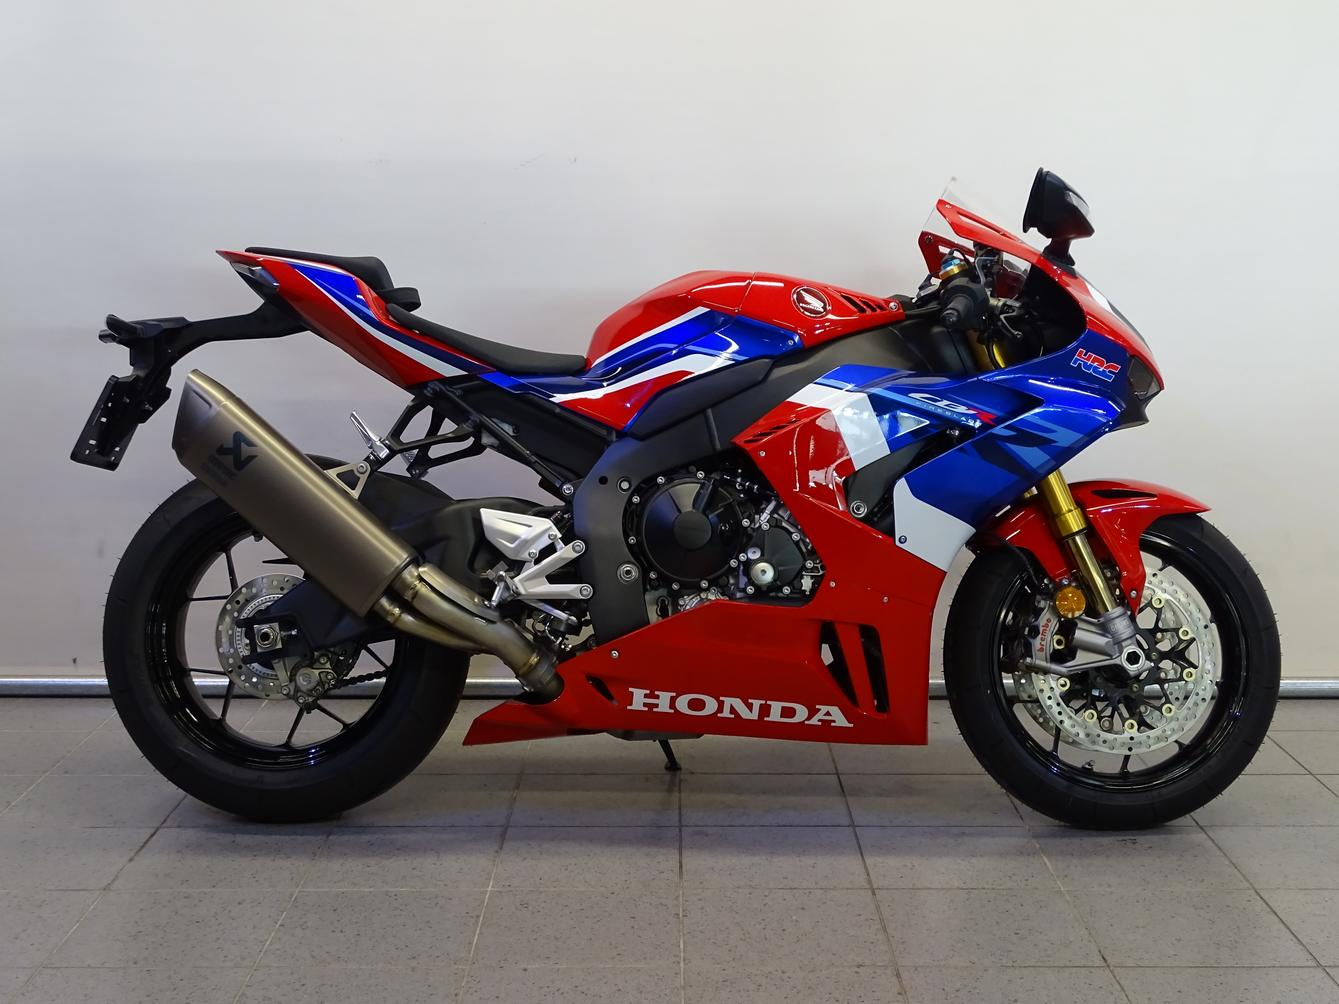 HONDA - CBR 1000 RR SP